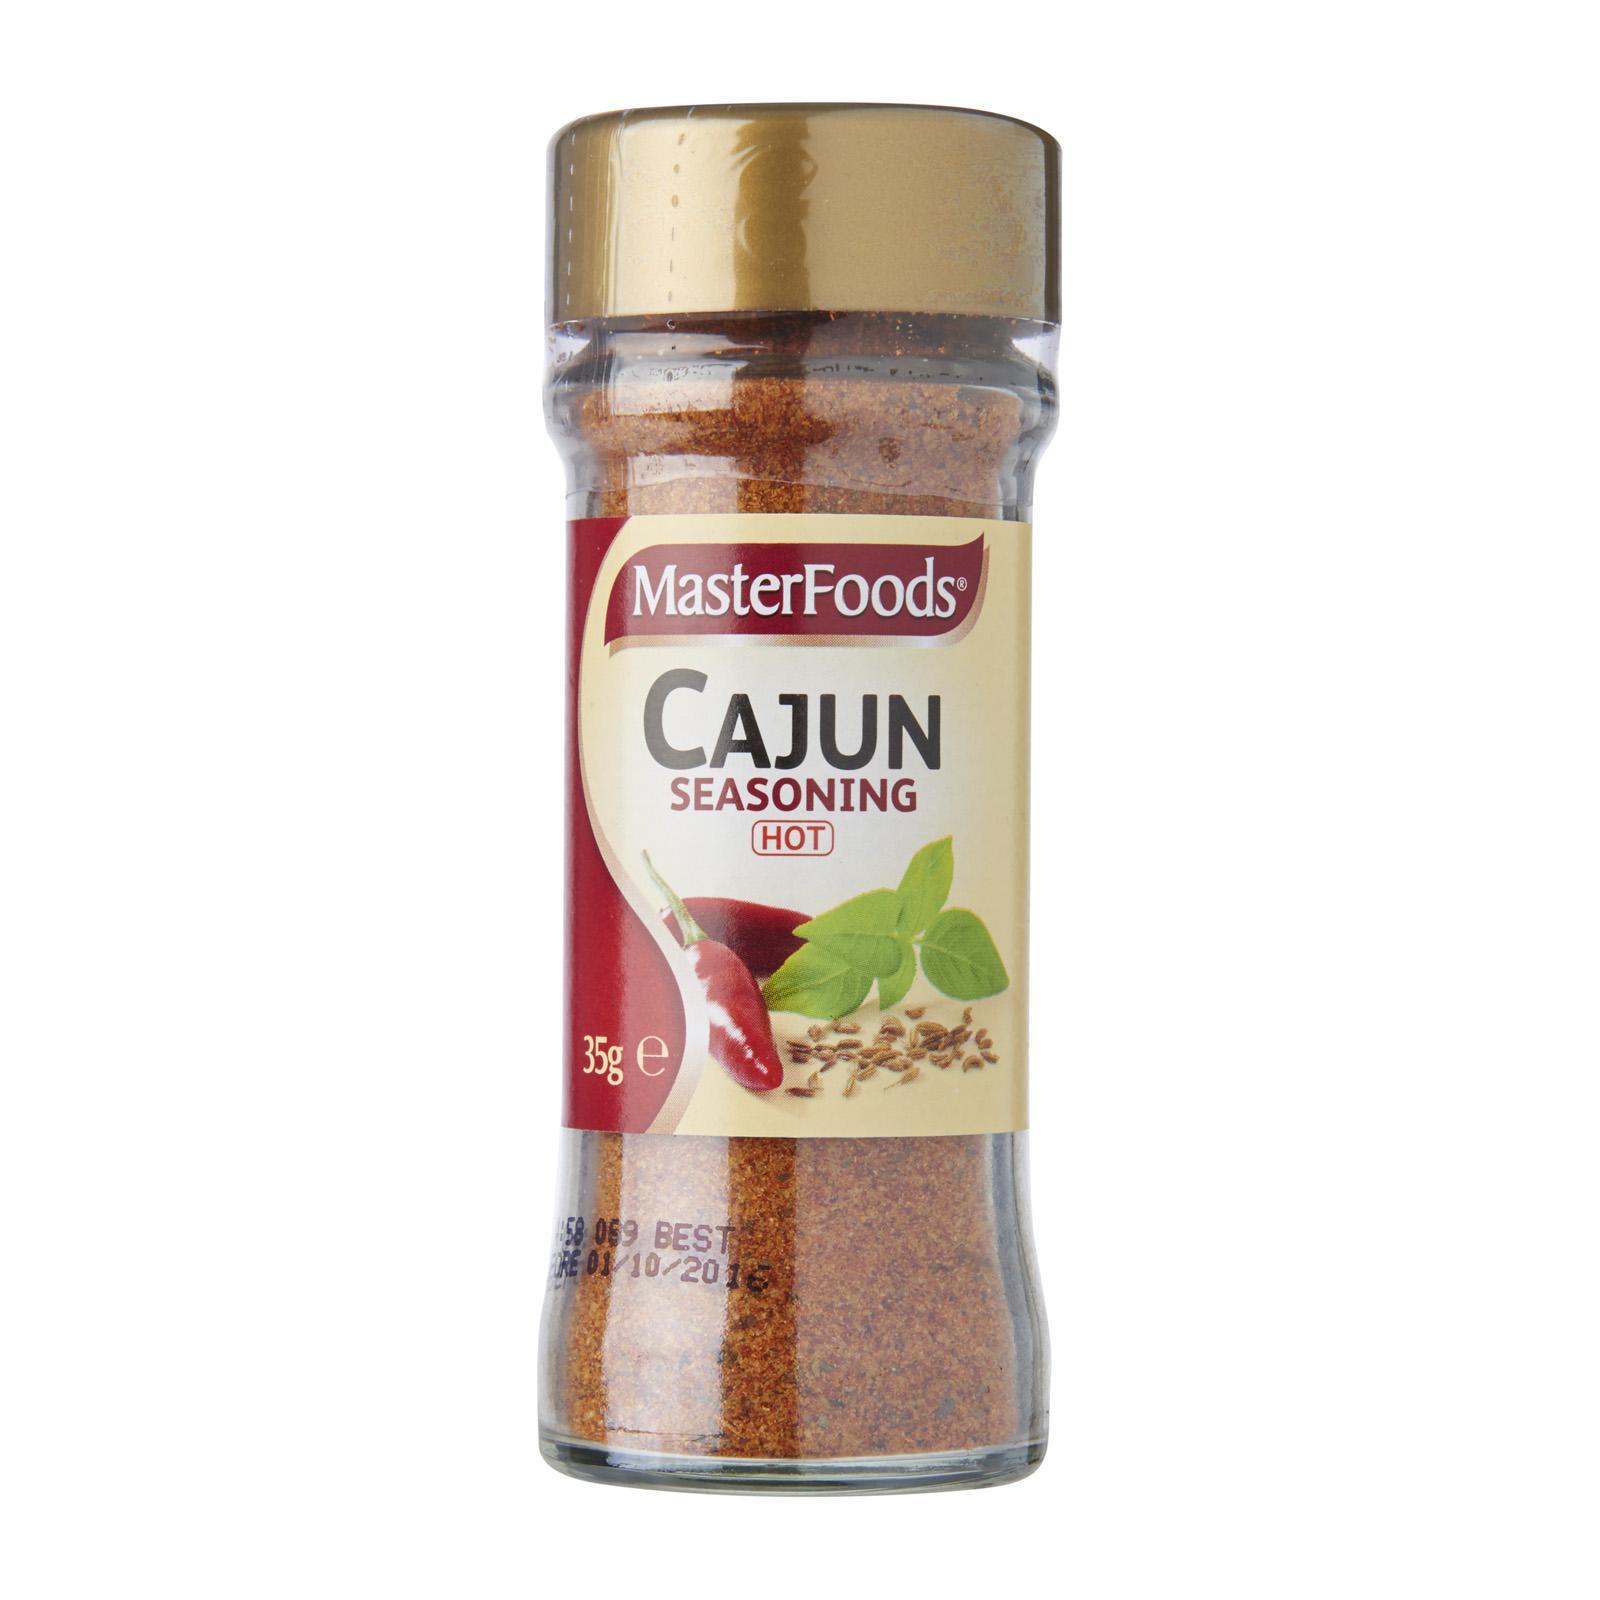 Masterfoods Cajun Seasoning Jar